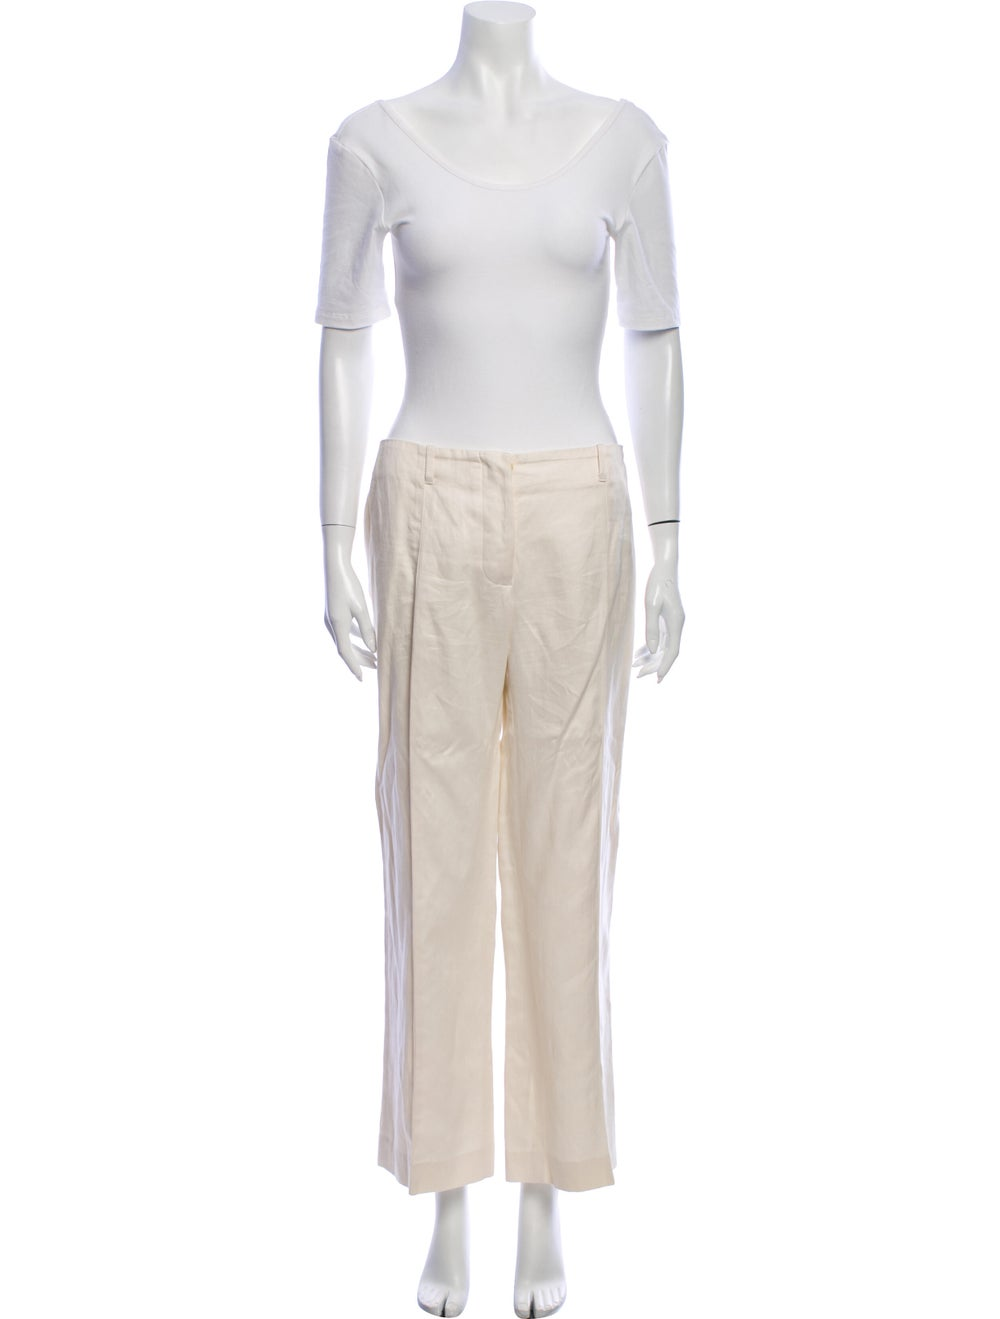 Costume National Pantsuit - image 4